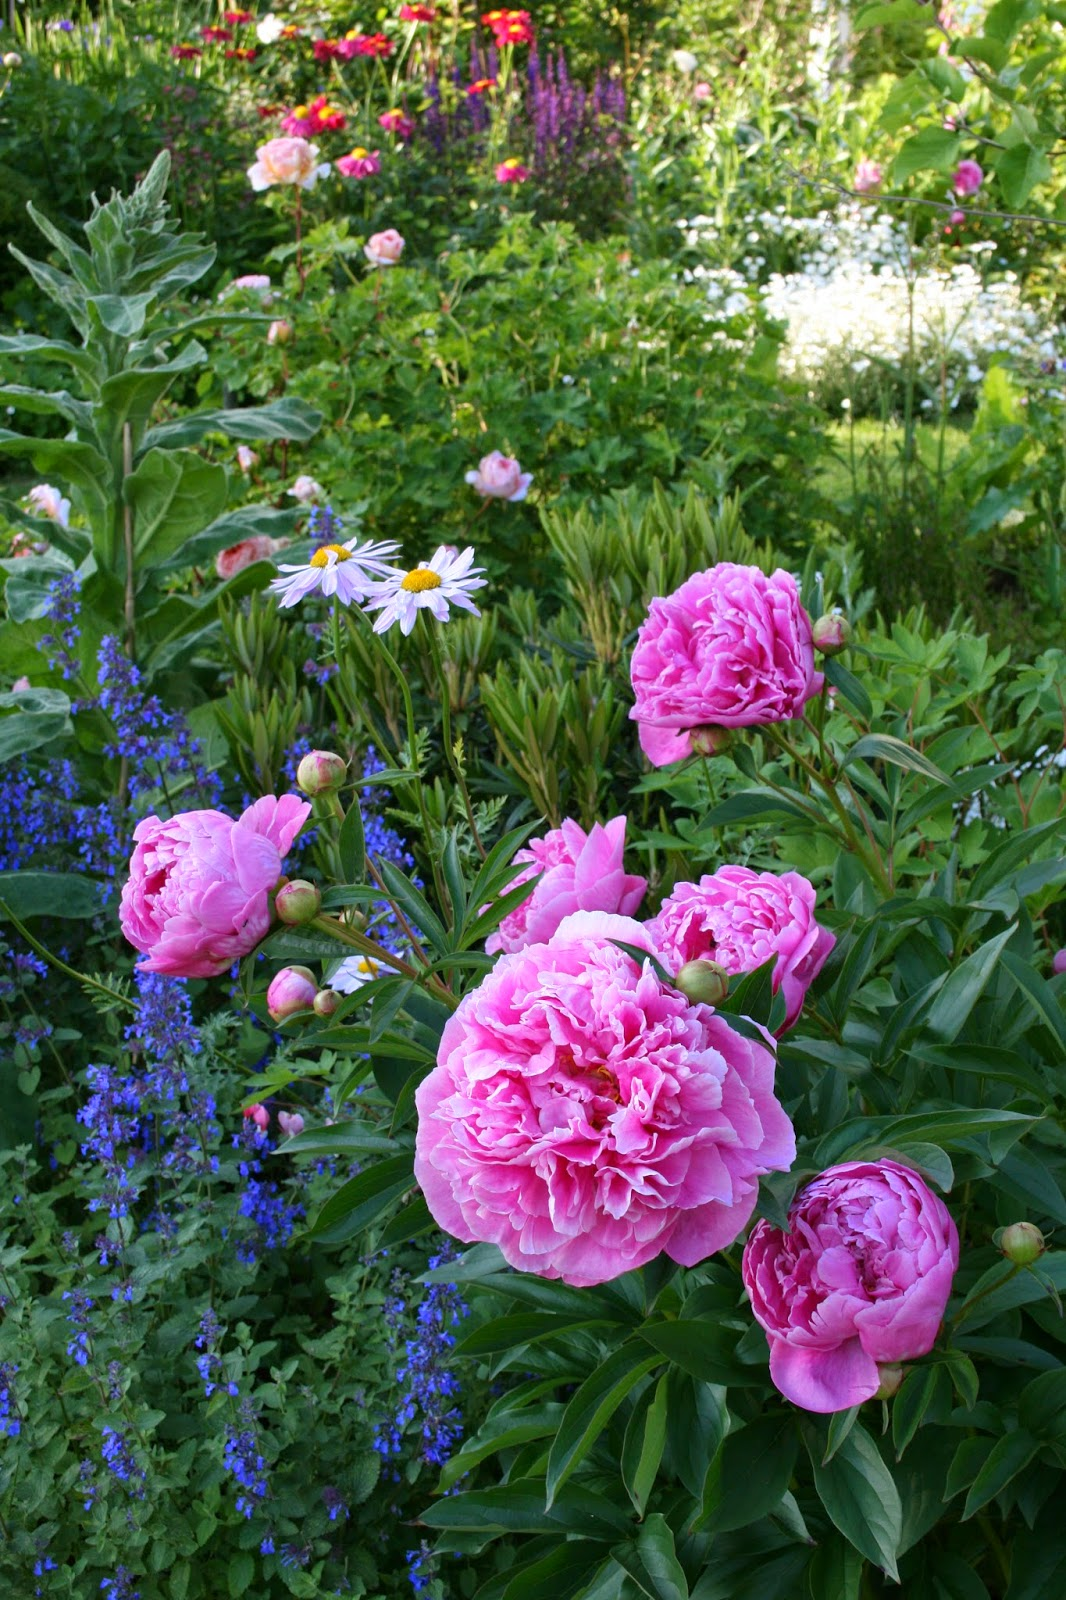 pionträdgård